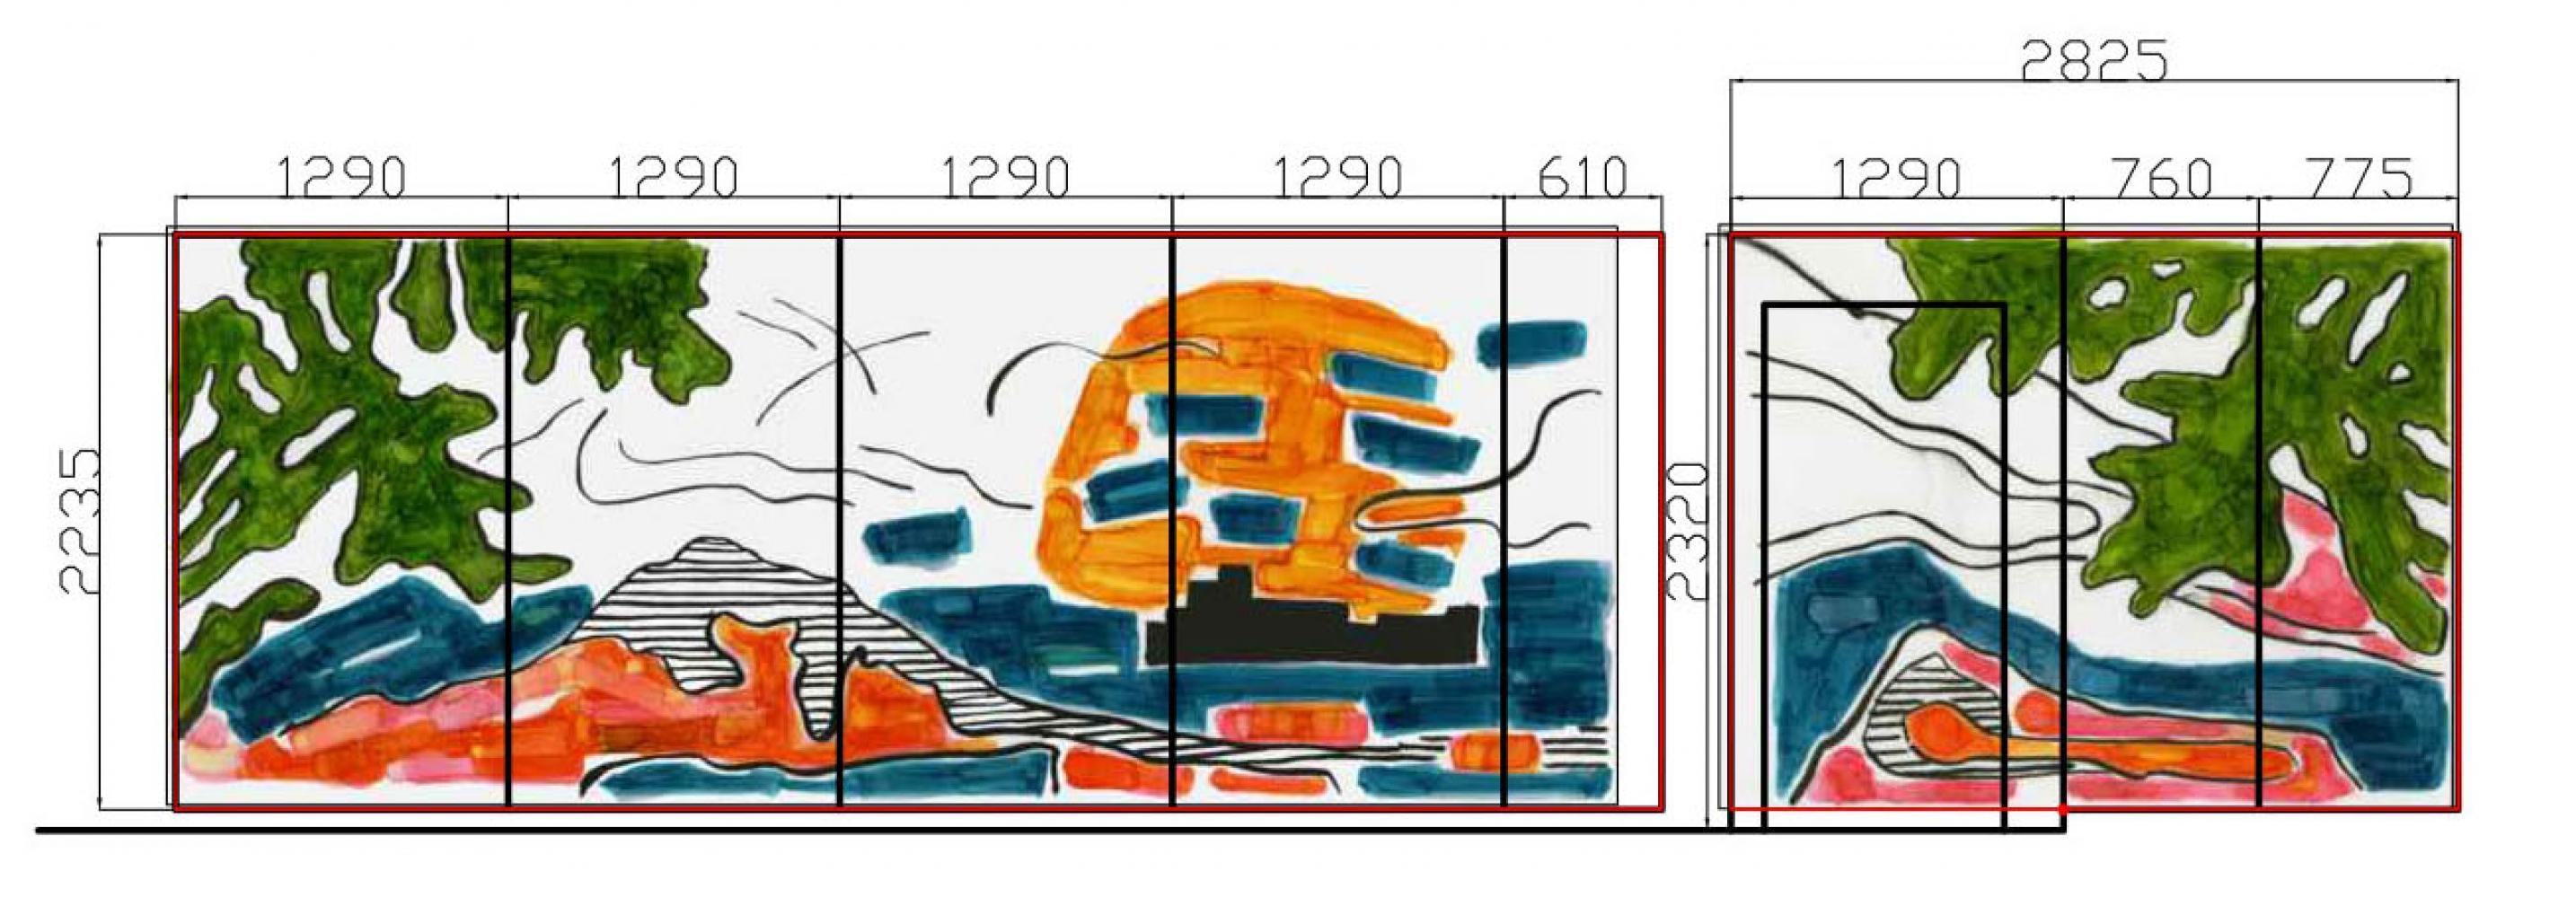 01-meaux-img-012 Pascale SEURIN Architecte - Pascale SEURIN Architecte